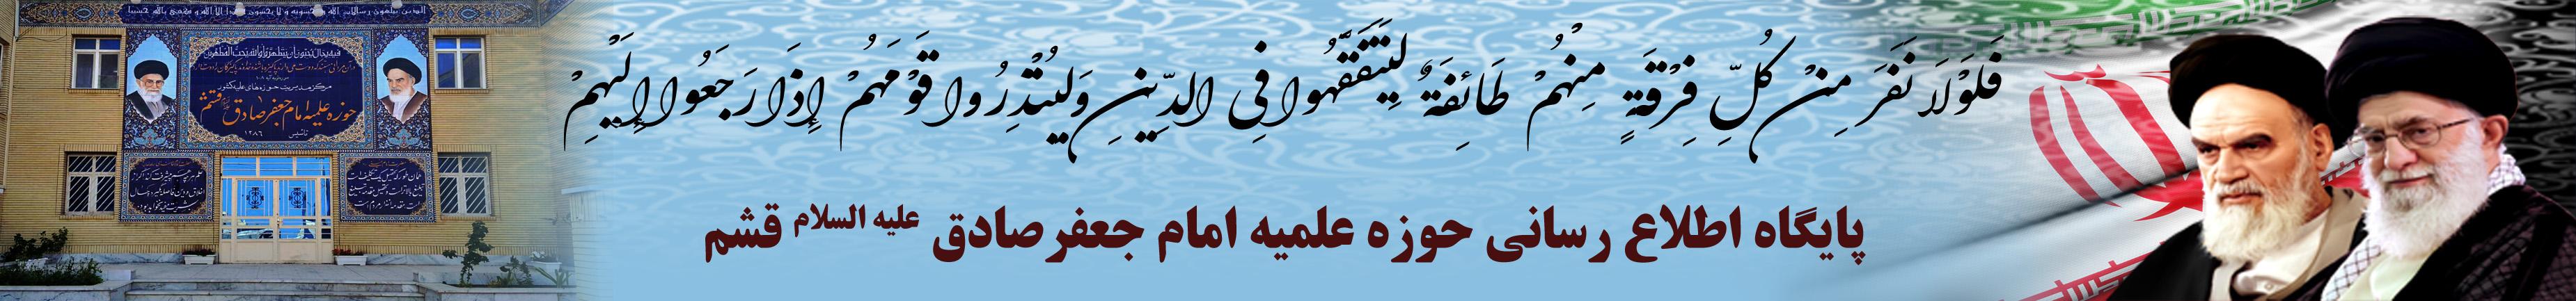 پرتال خبری حوزه علمیه امام جعفرصادق علیه السلام قشم